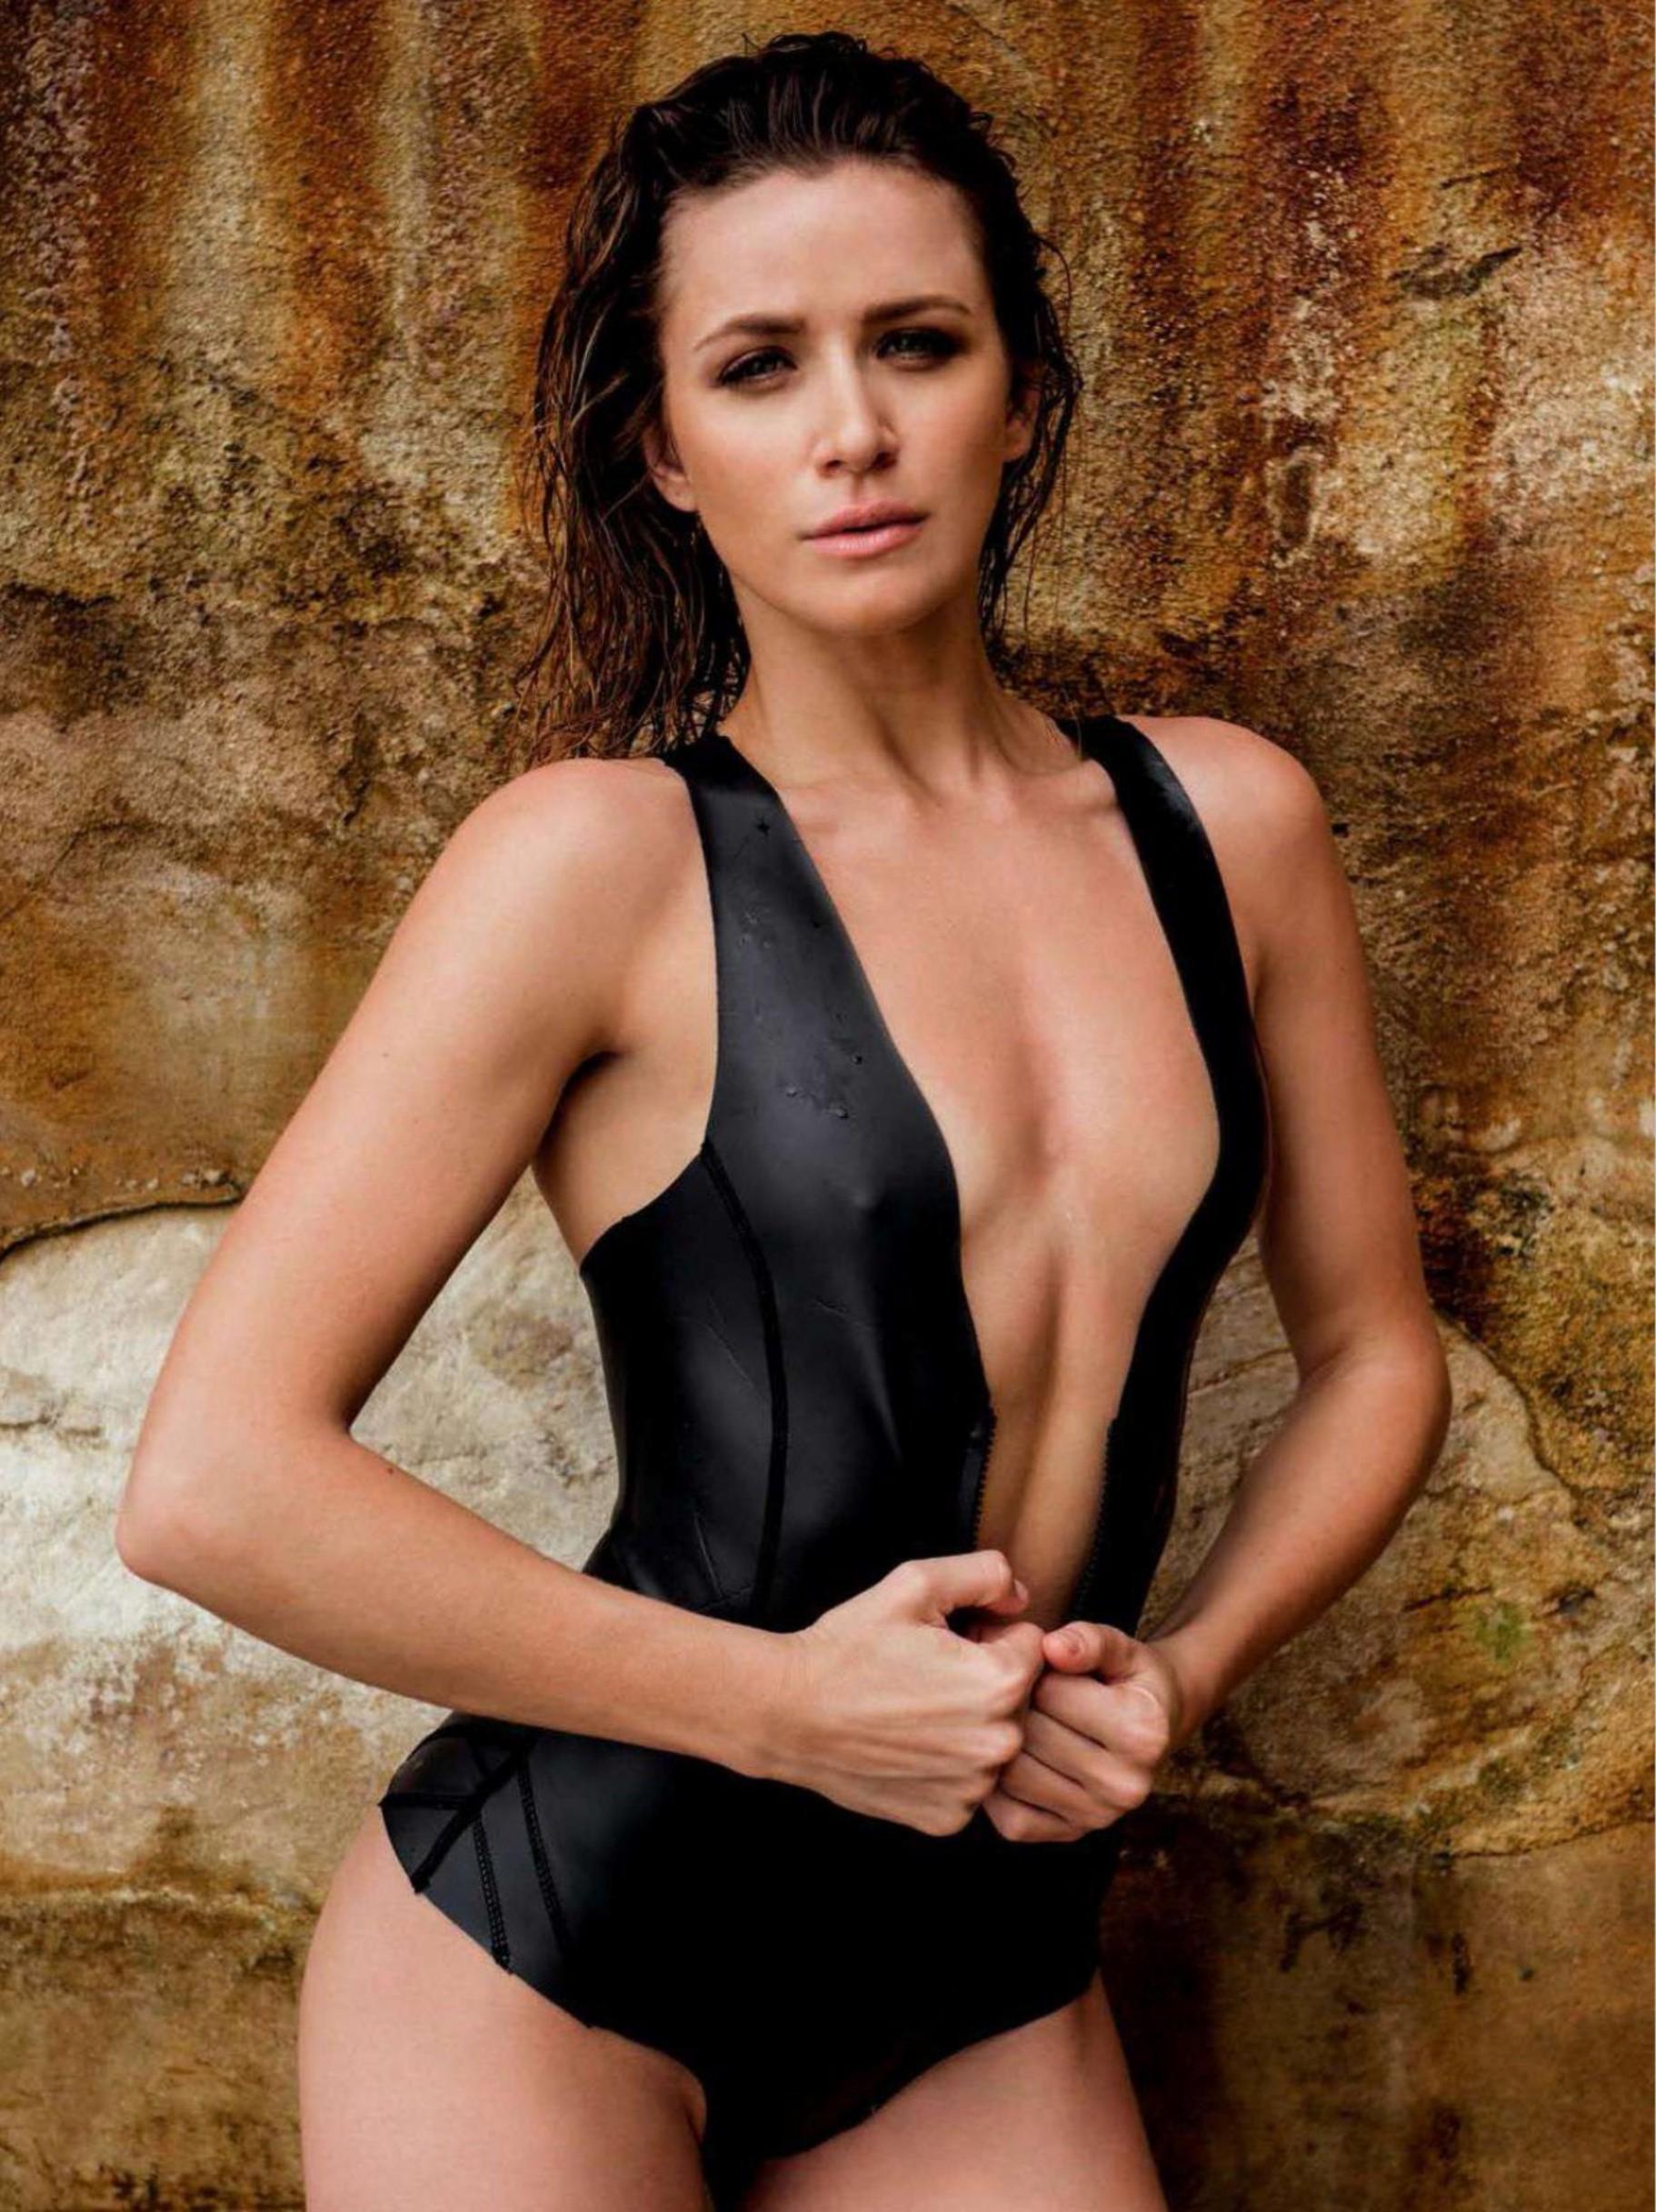 Shantel Vansanten Nude Naked Pics And Videos Imperiodefamosas